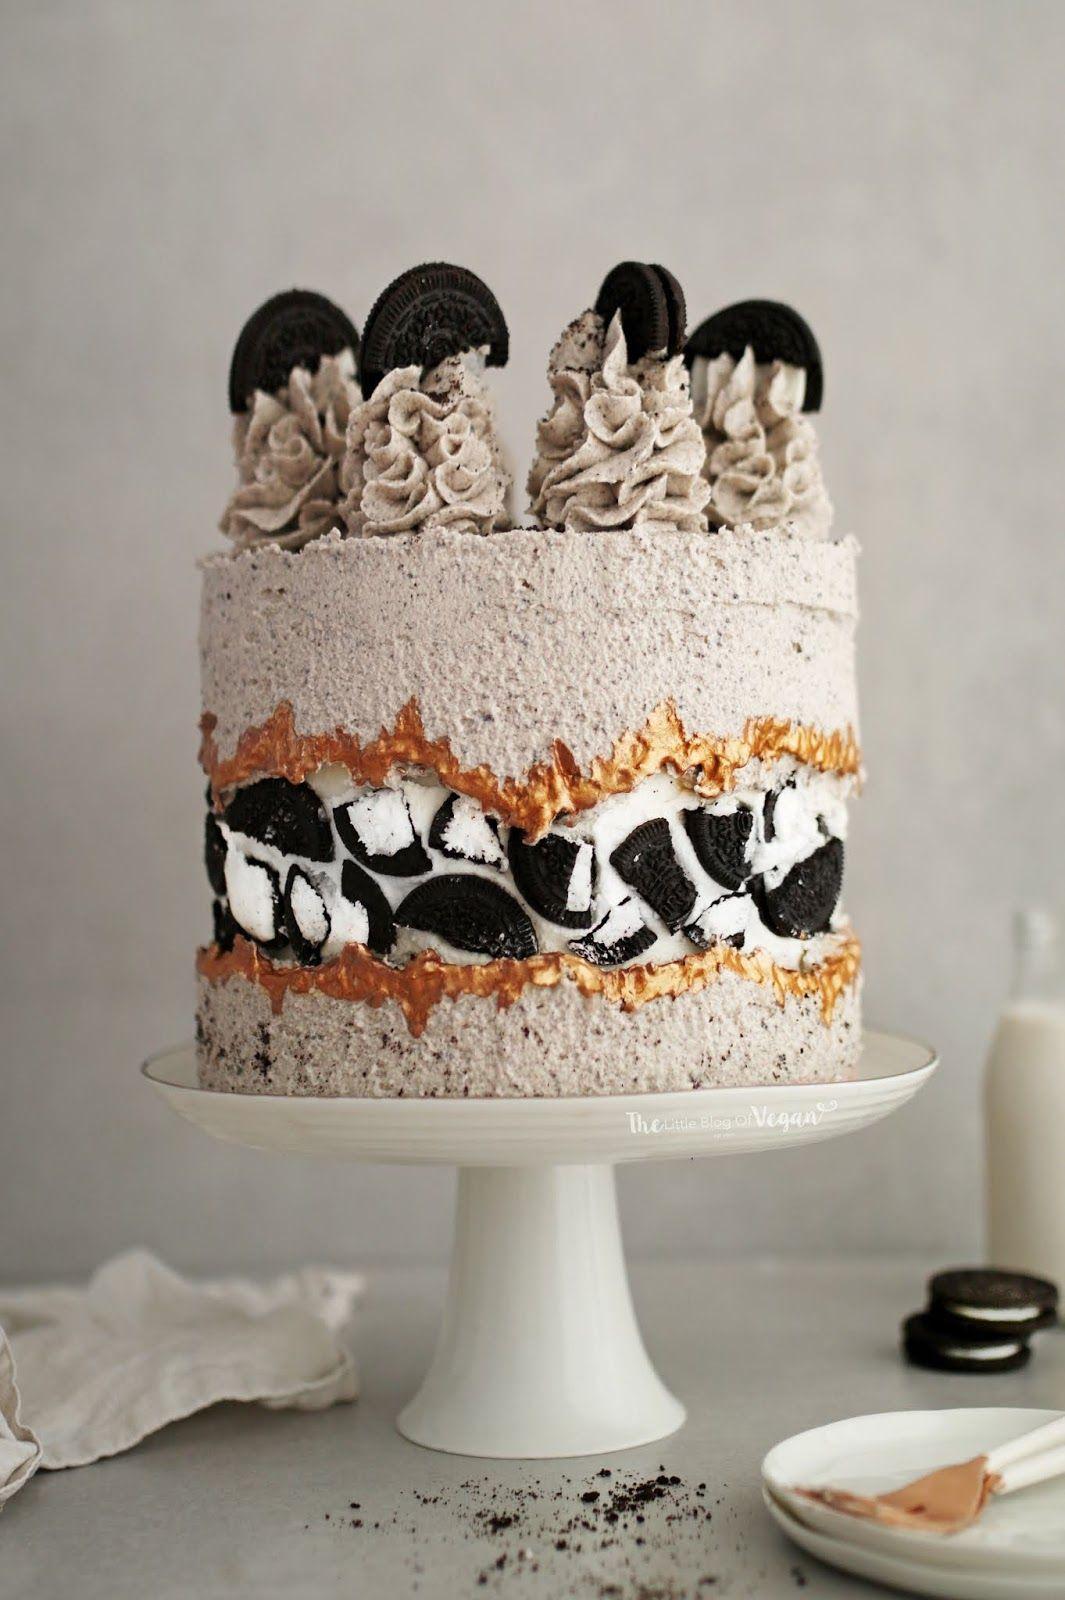 Oreo fault line cake recipe   Cake, Oreo cake, Cake recipes